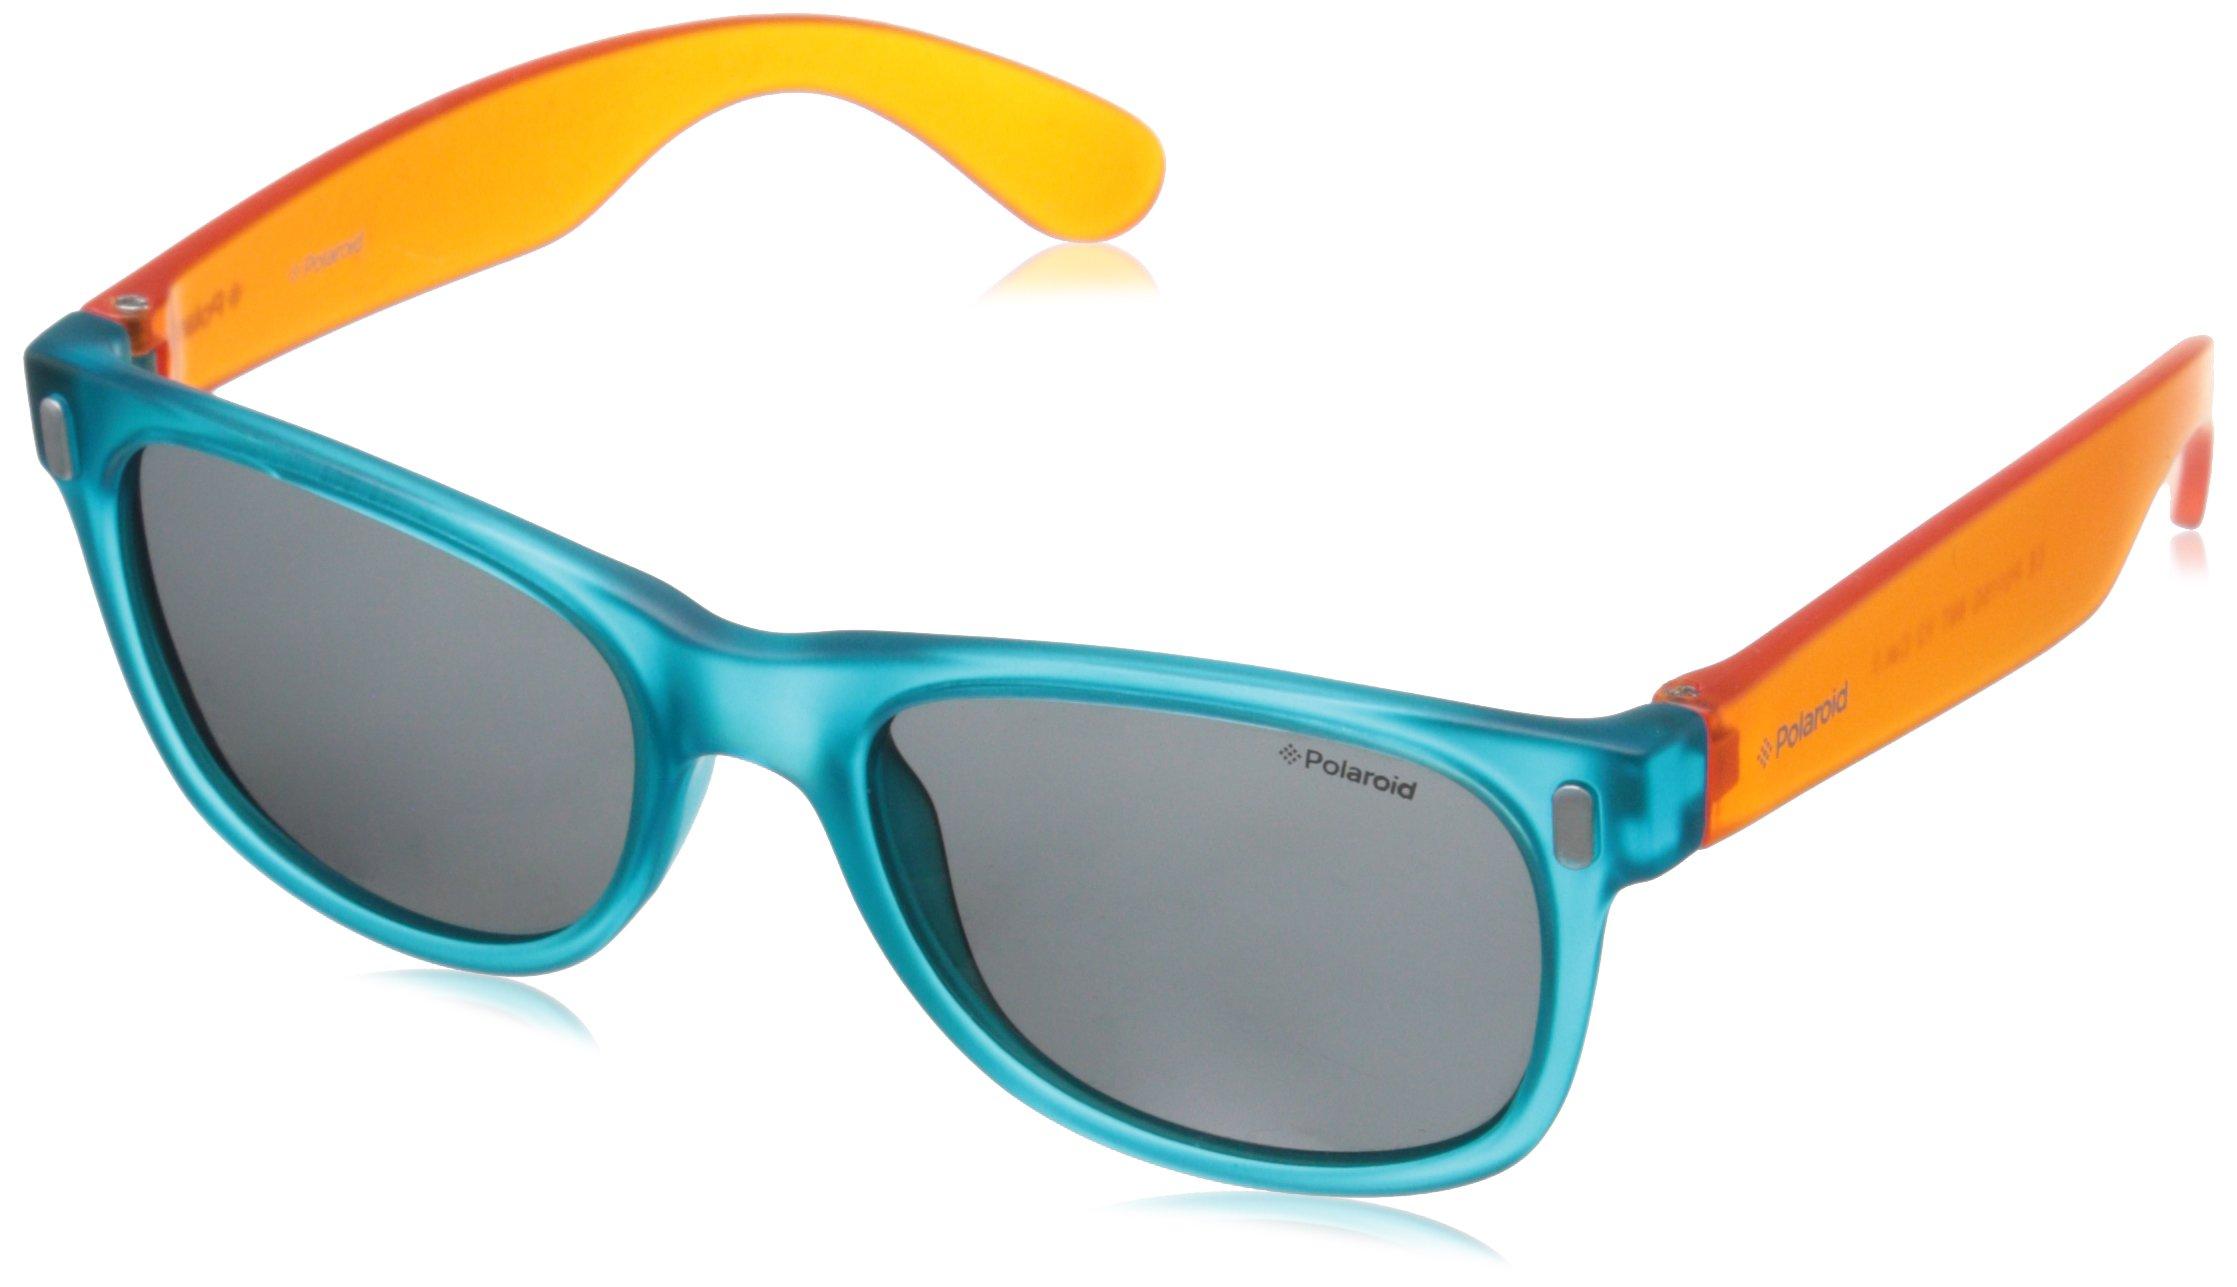 Polaroid Sunglasses Boy's P0115s Polarized Rectangular Sunglasses, B-BLUE ORANGE, 46 mm